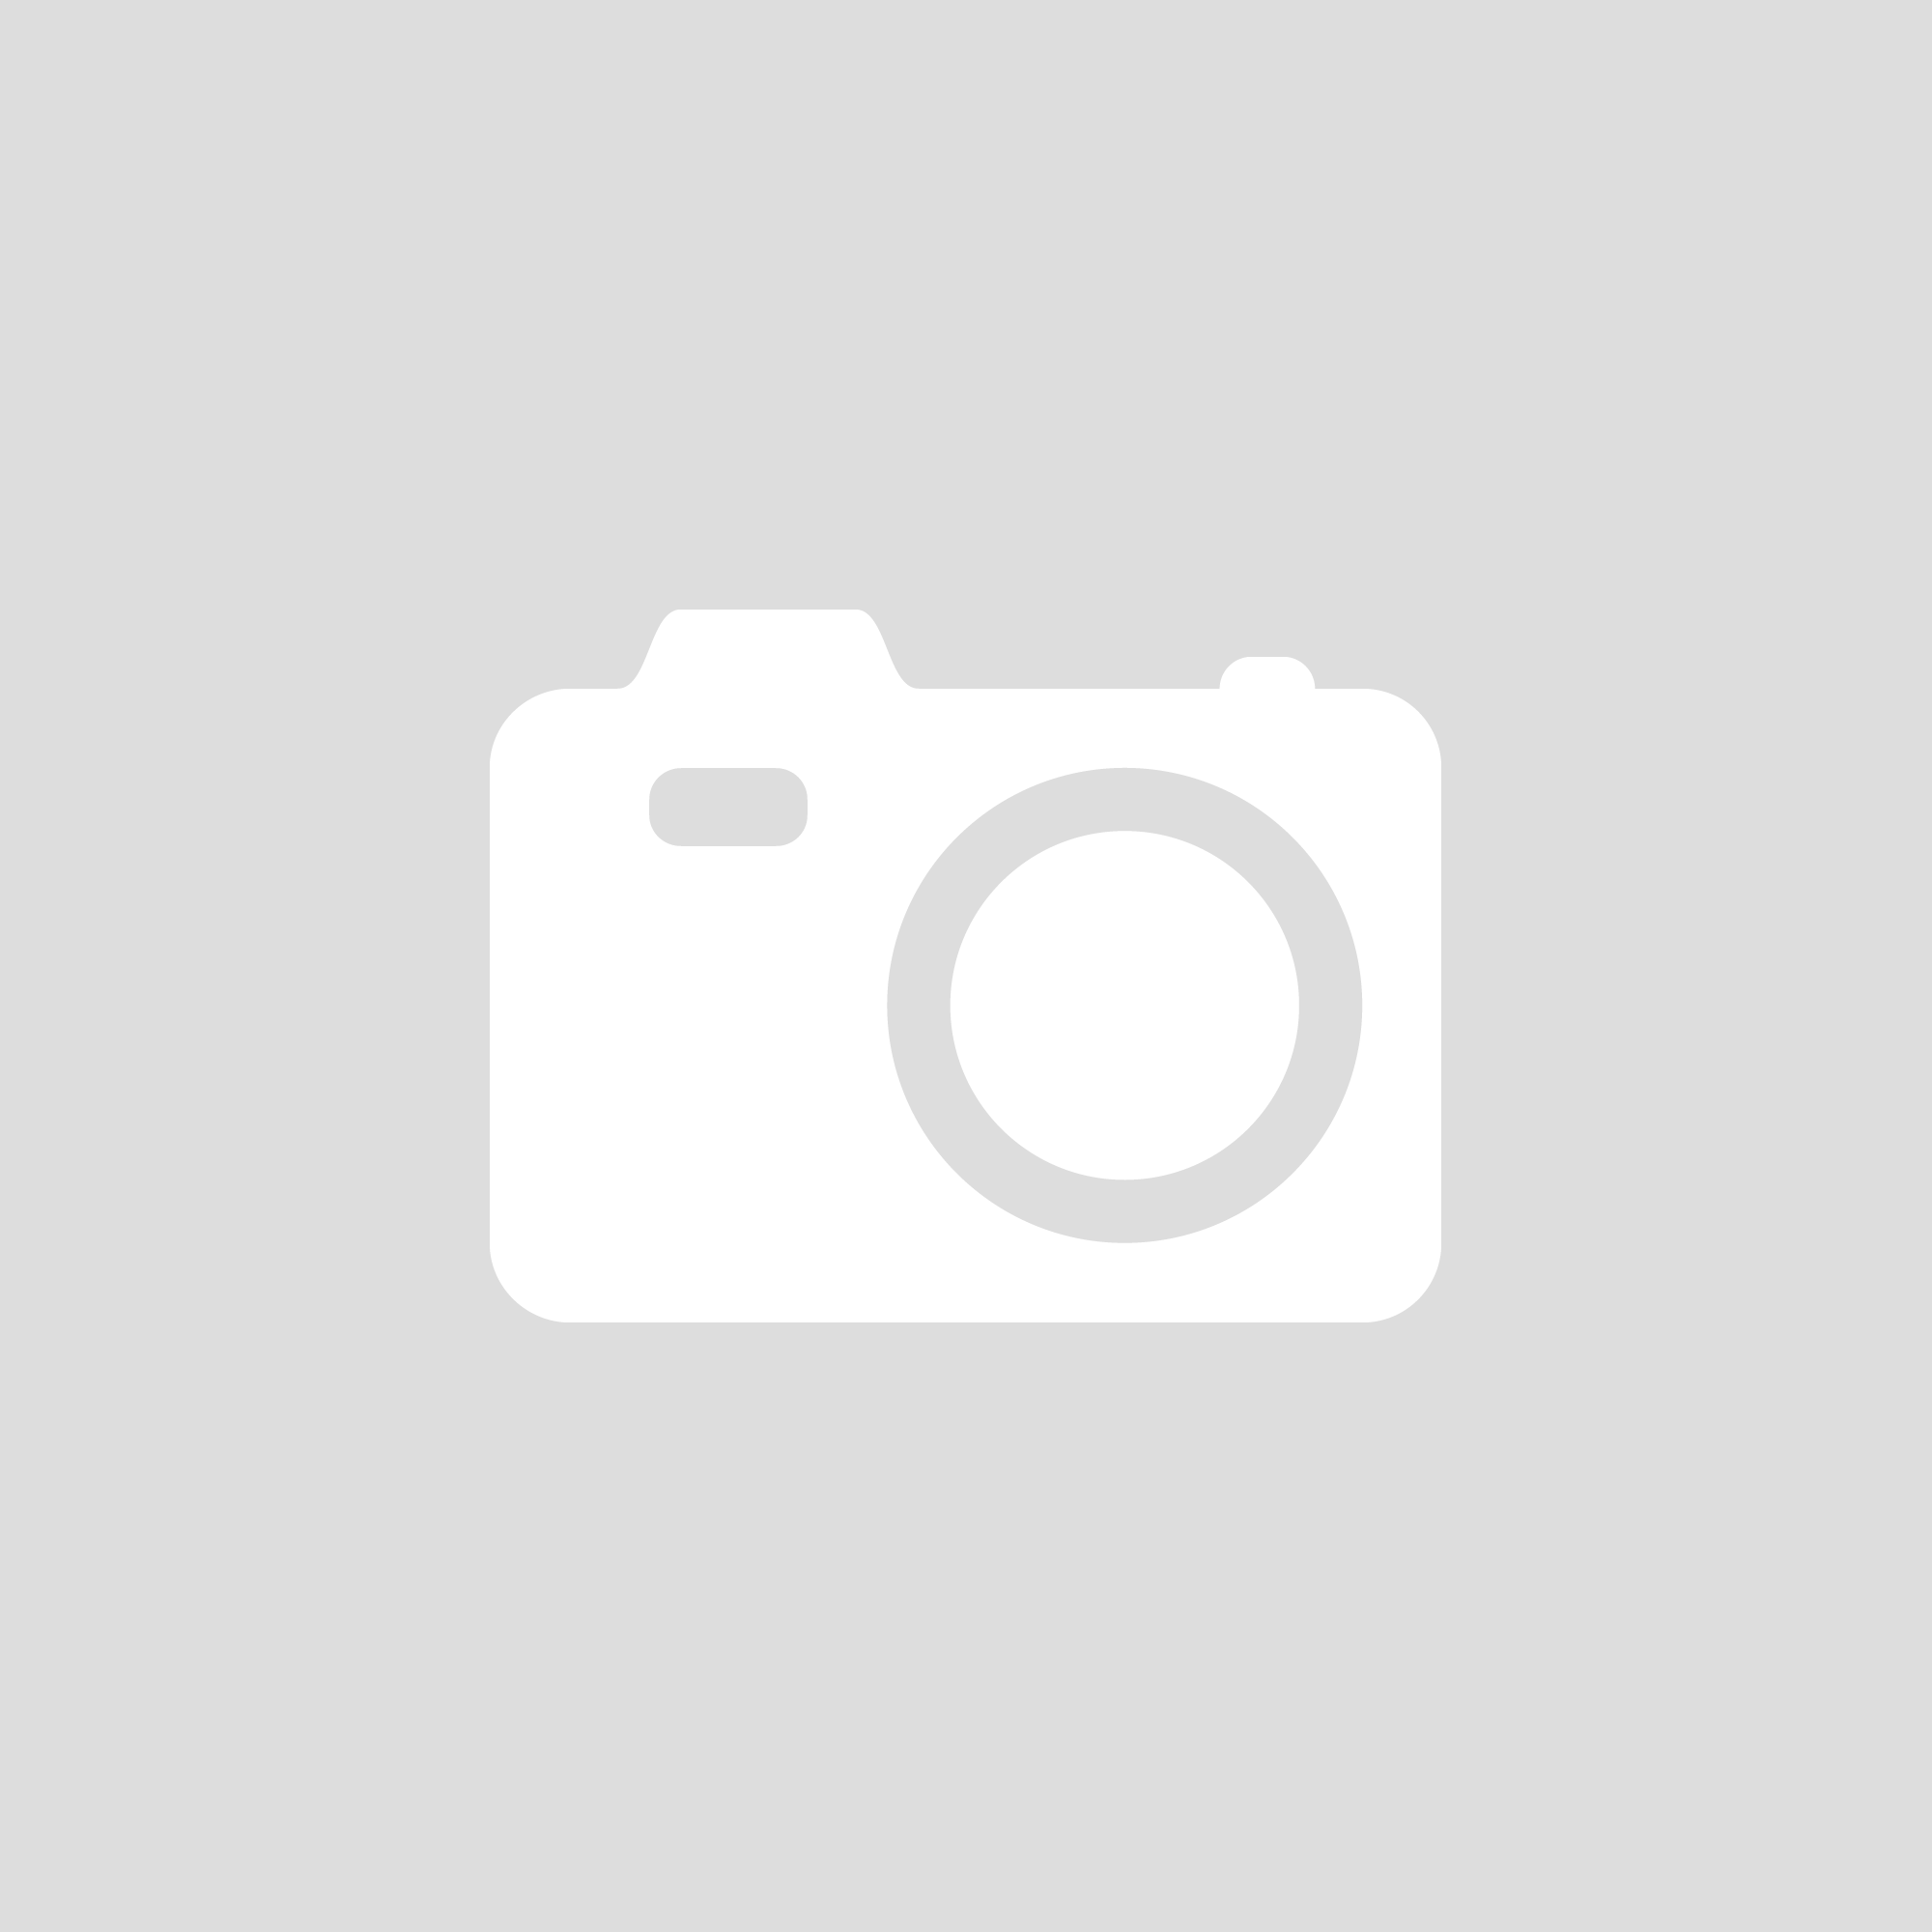 Tiffany Lustre Plain Soft Green Texture Wallpaper by Belgravia GB 137